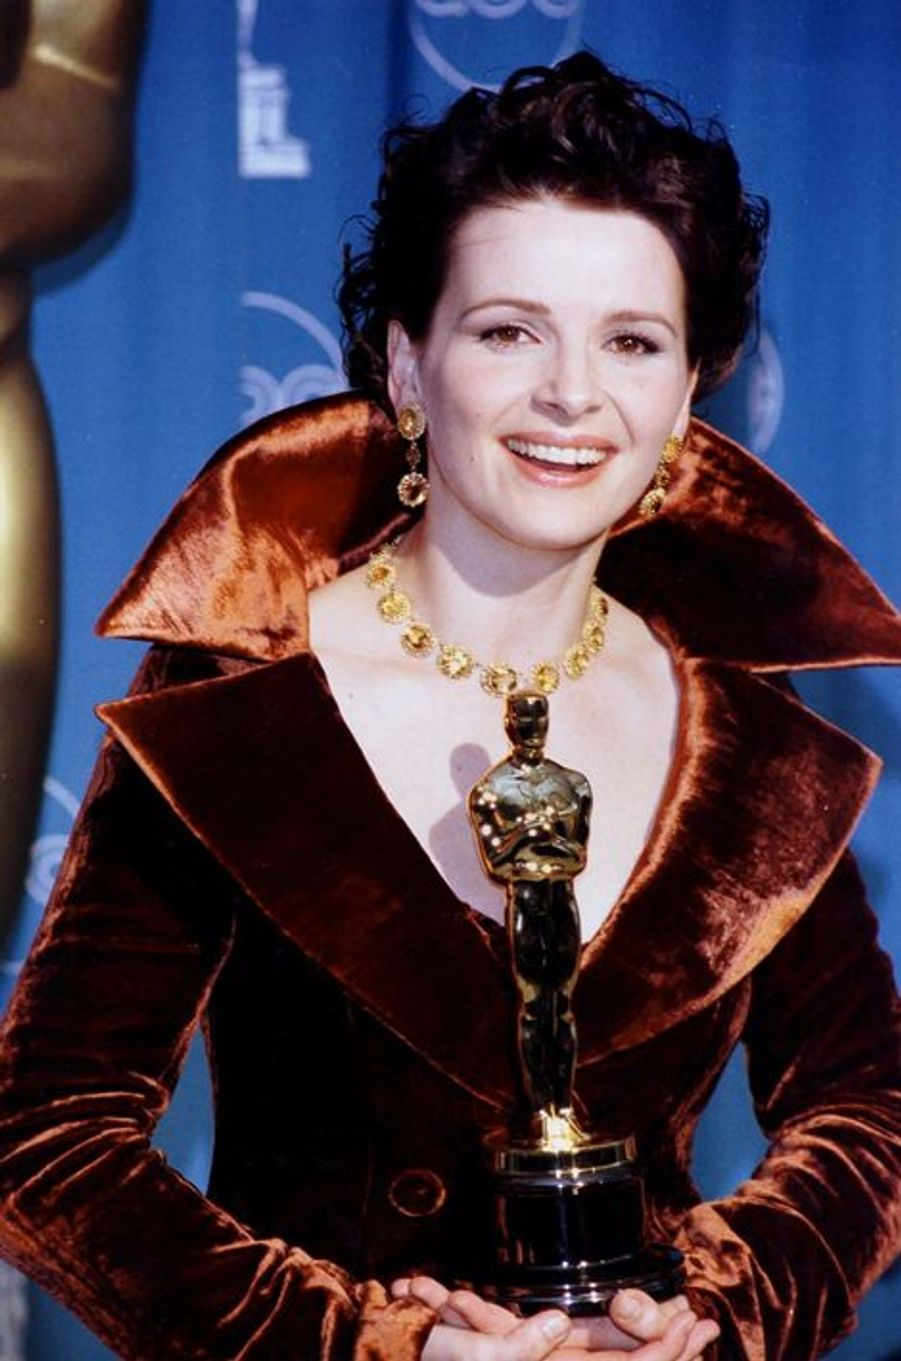 Juliette Binoche remporte l'Oscar de Meilleur second rôle féminin, 1997